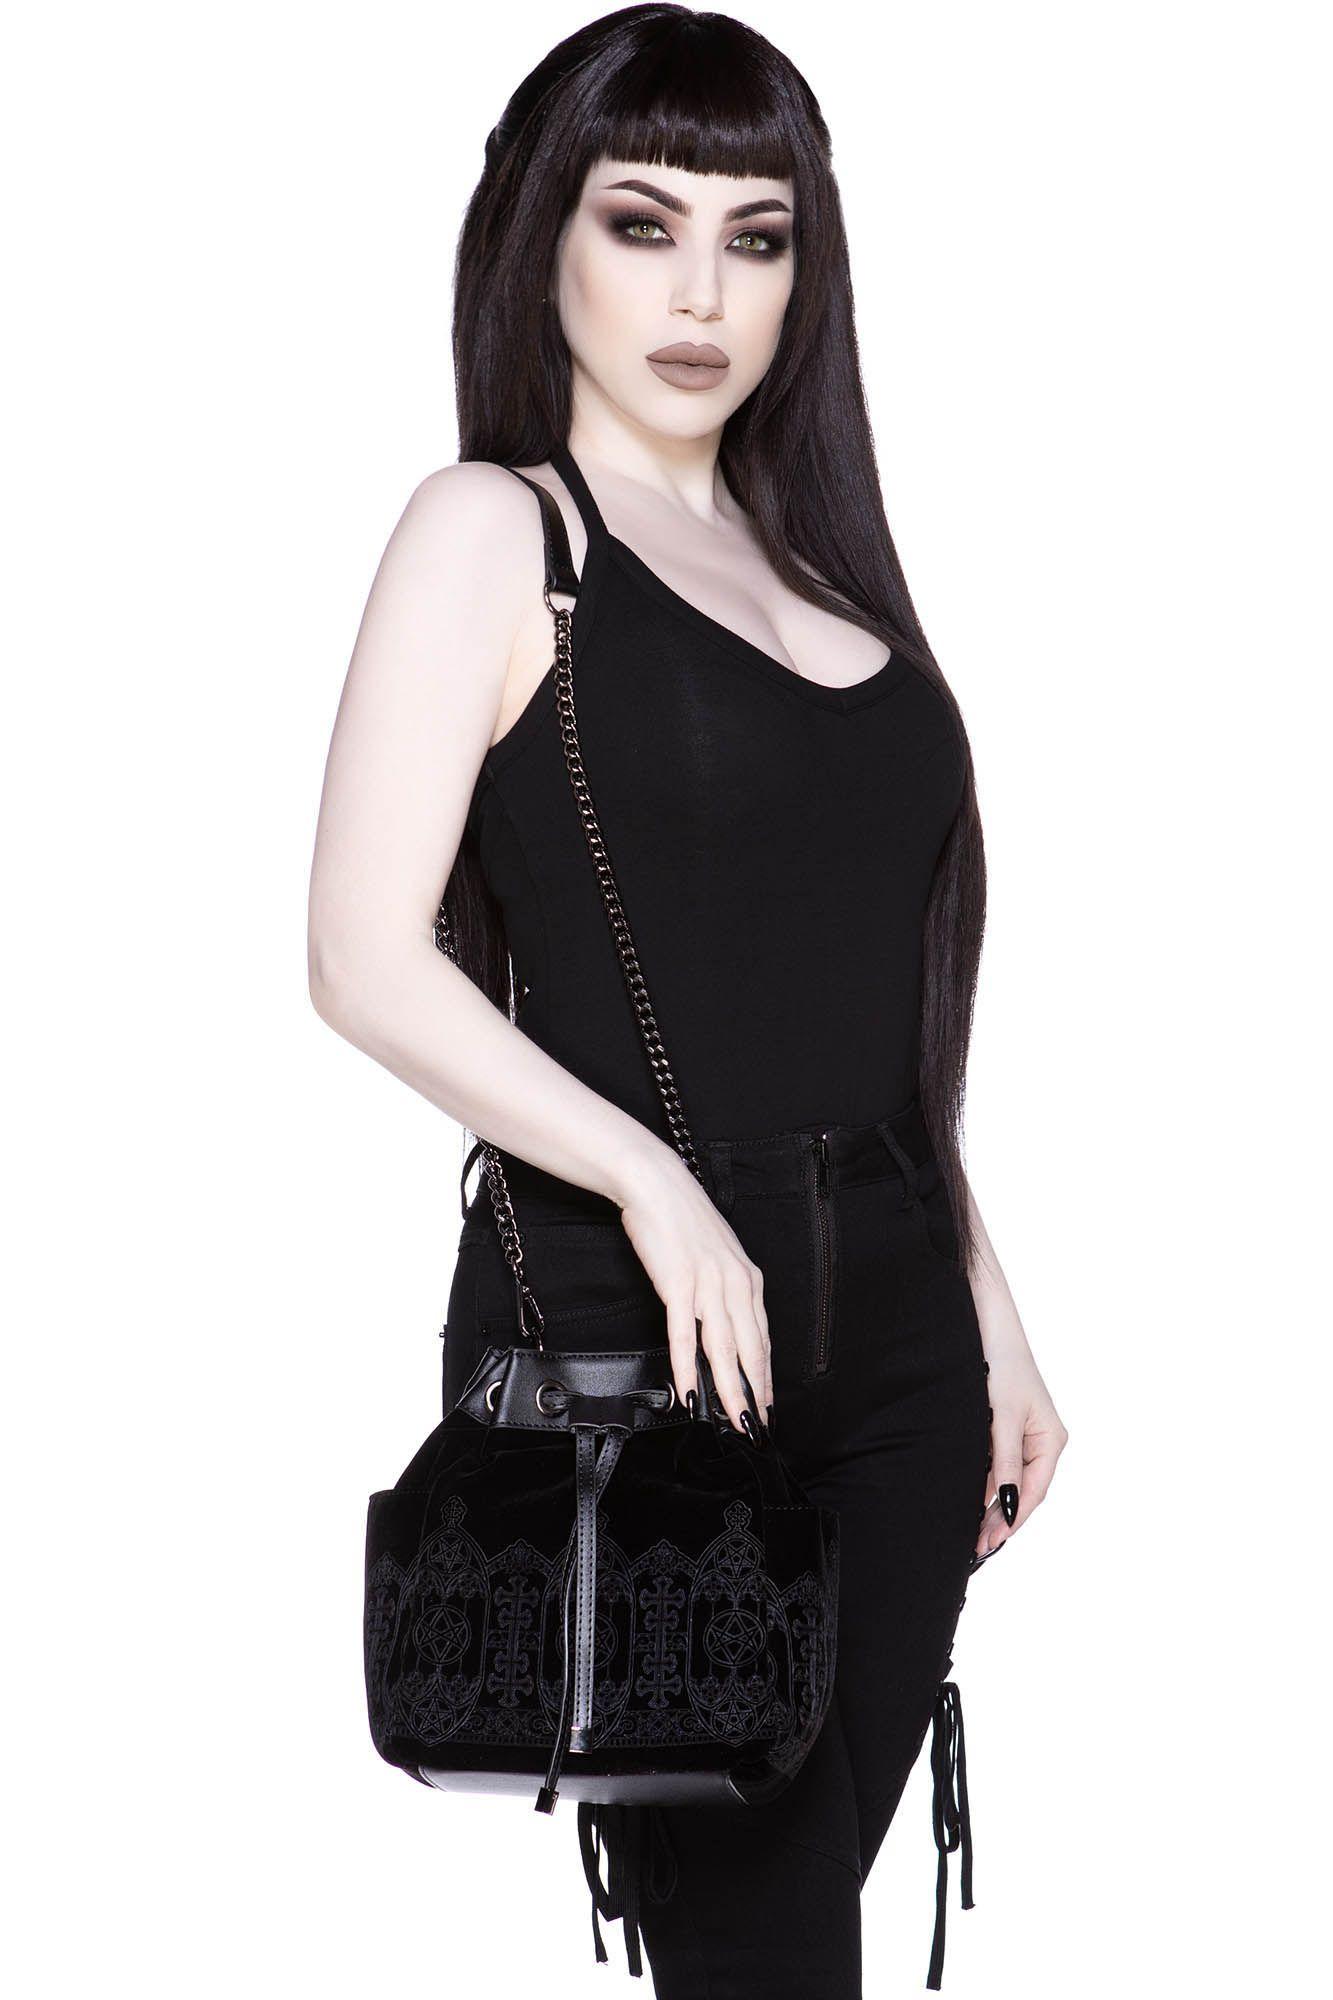 KS03388_sac-a-main-gothique-killstar-glam-rock-devils-mistress